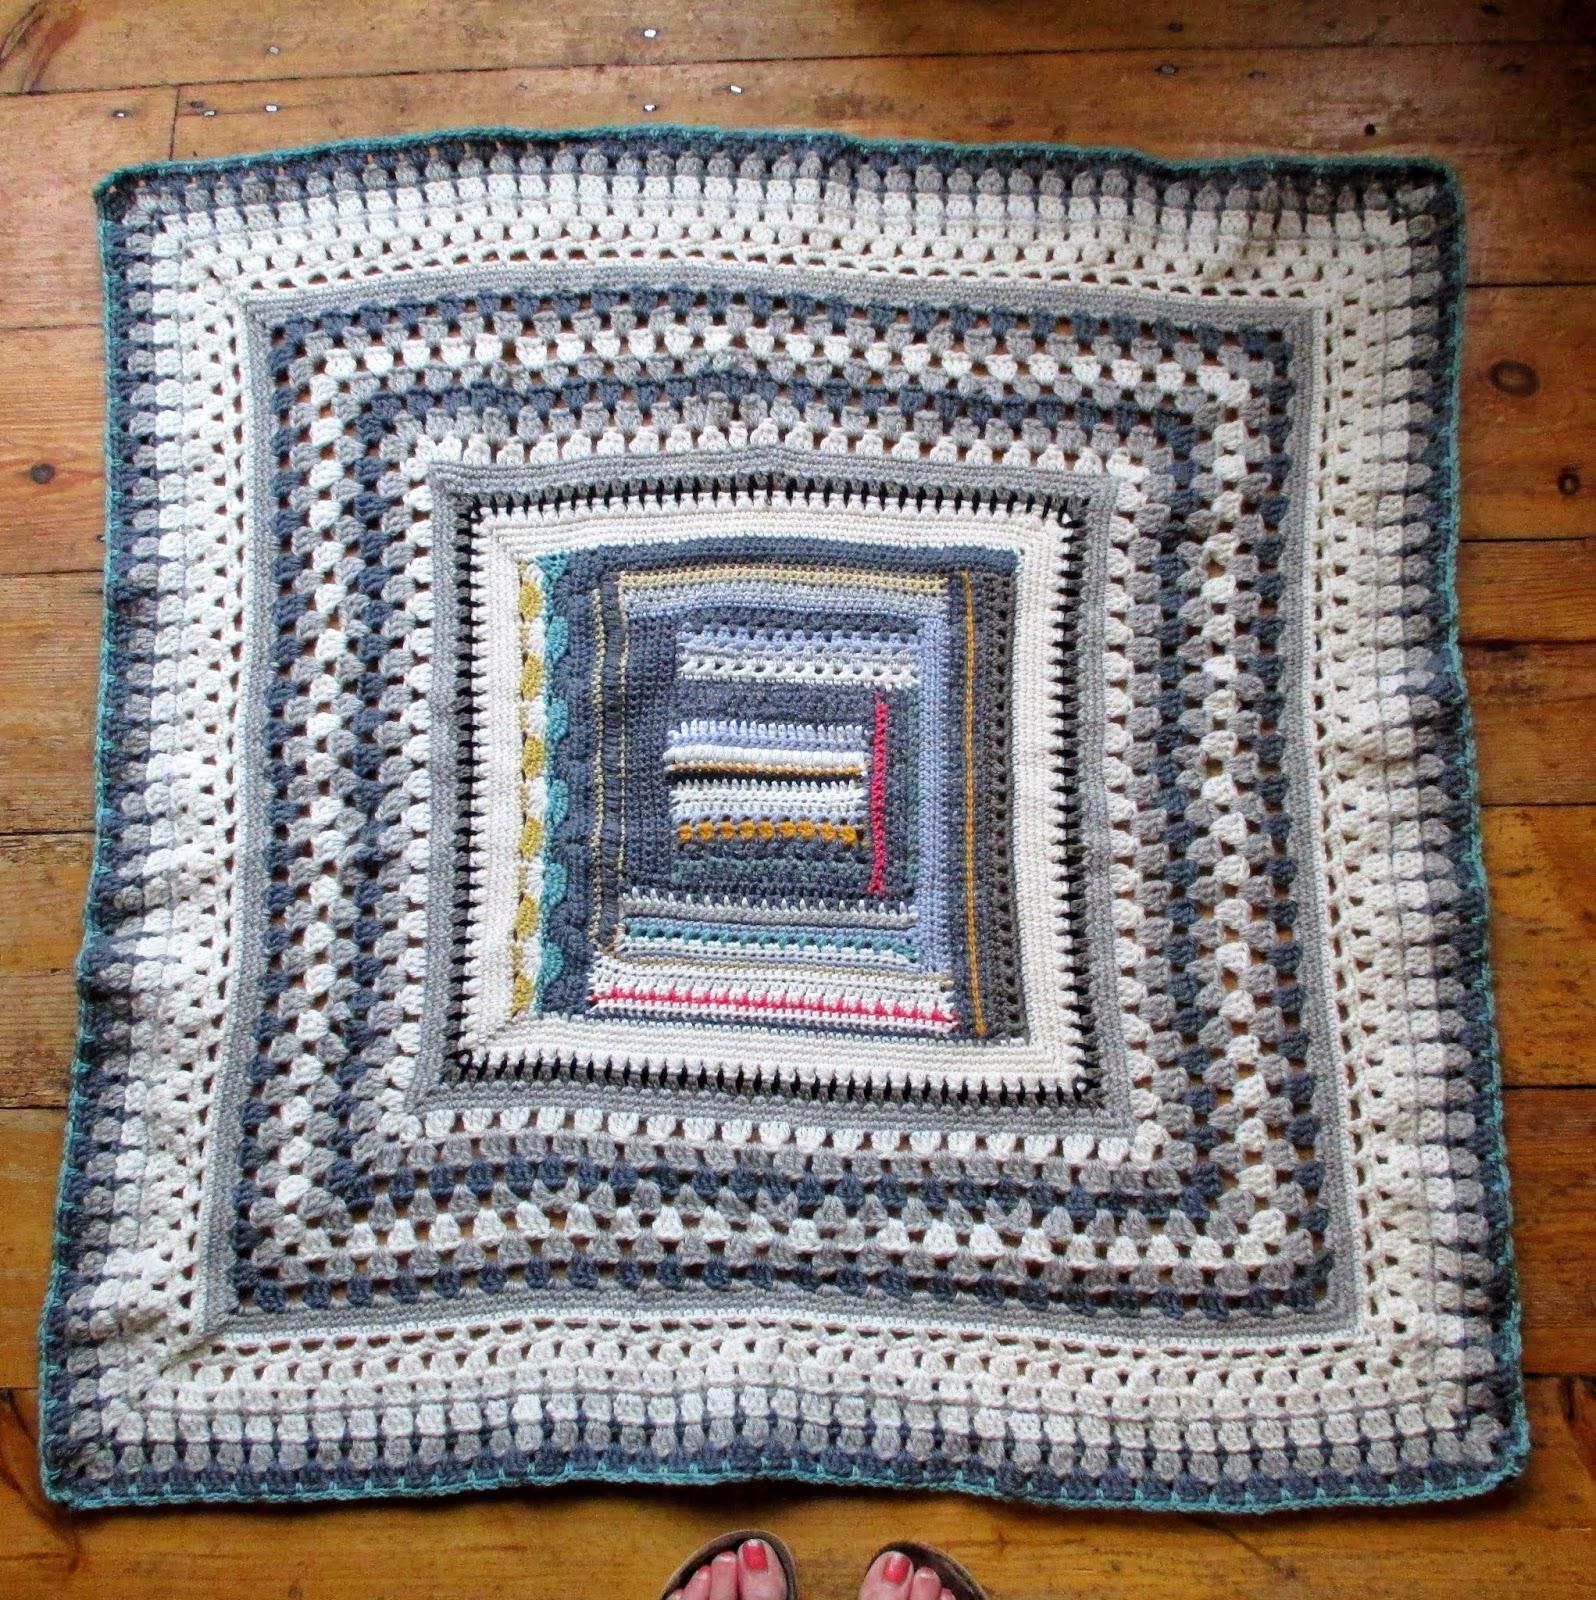 How to finish crochet